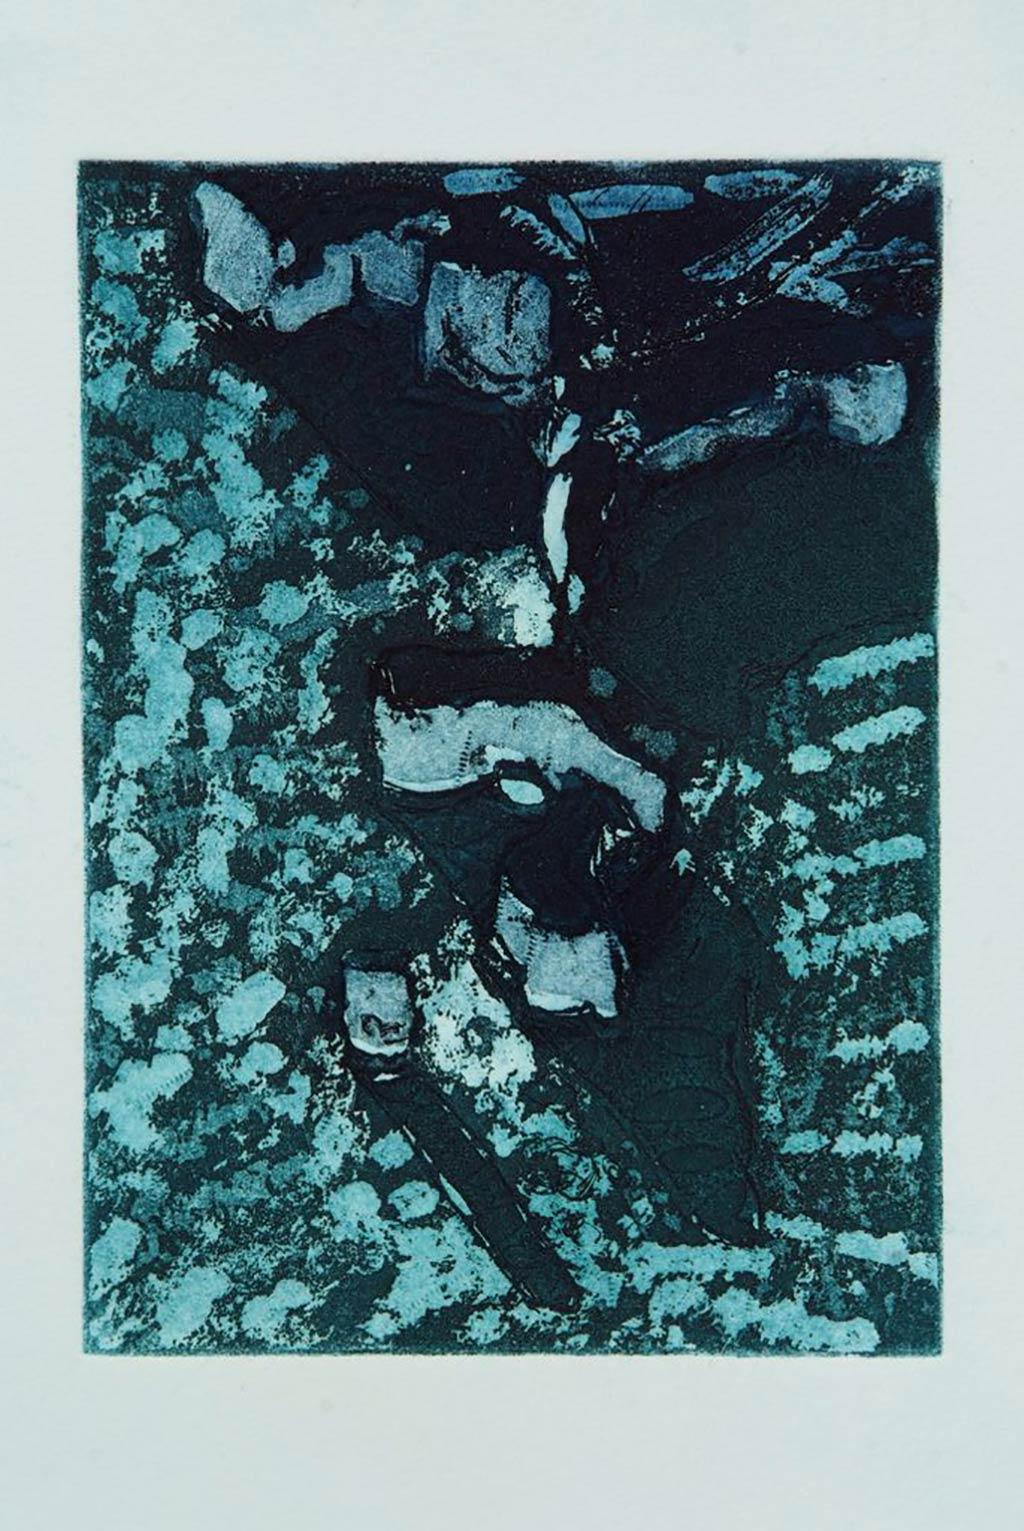 Purbeck-Coast-32x26-etching.